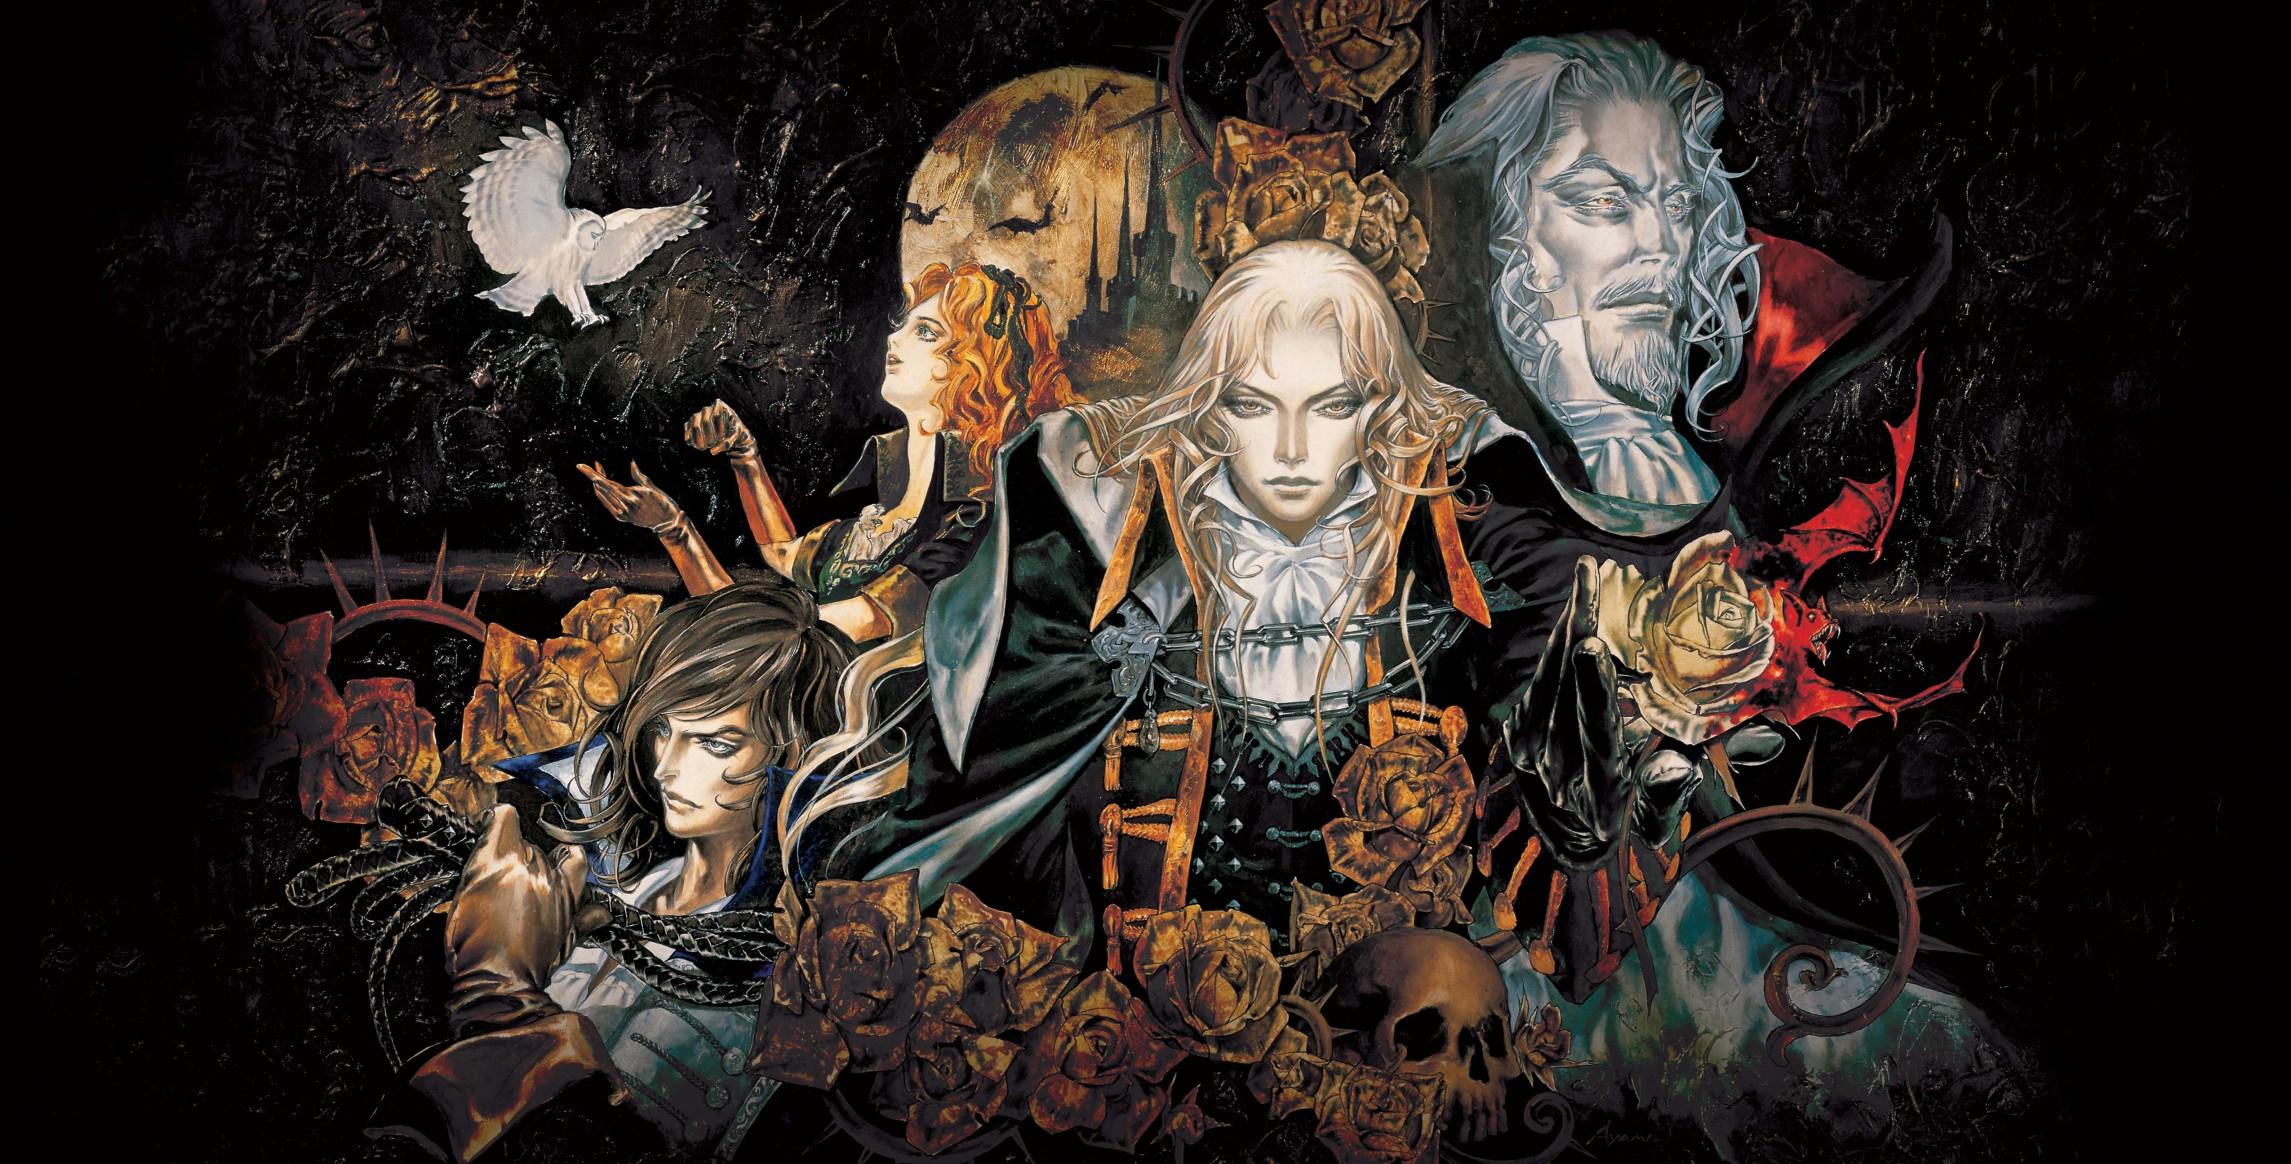 Castlevania: A Personal Retrospective